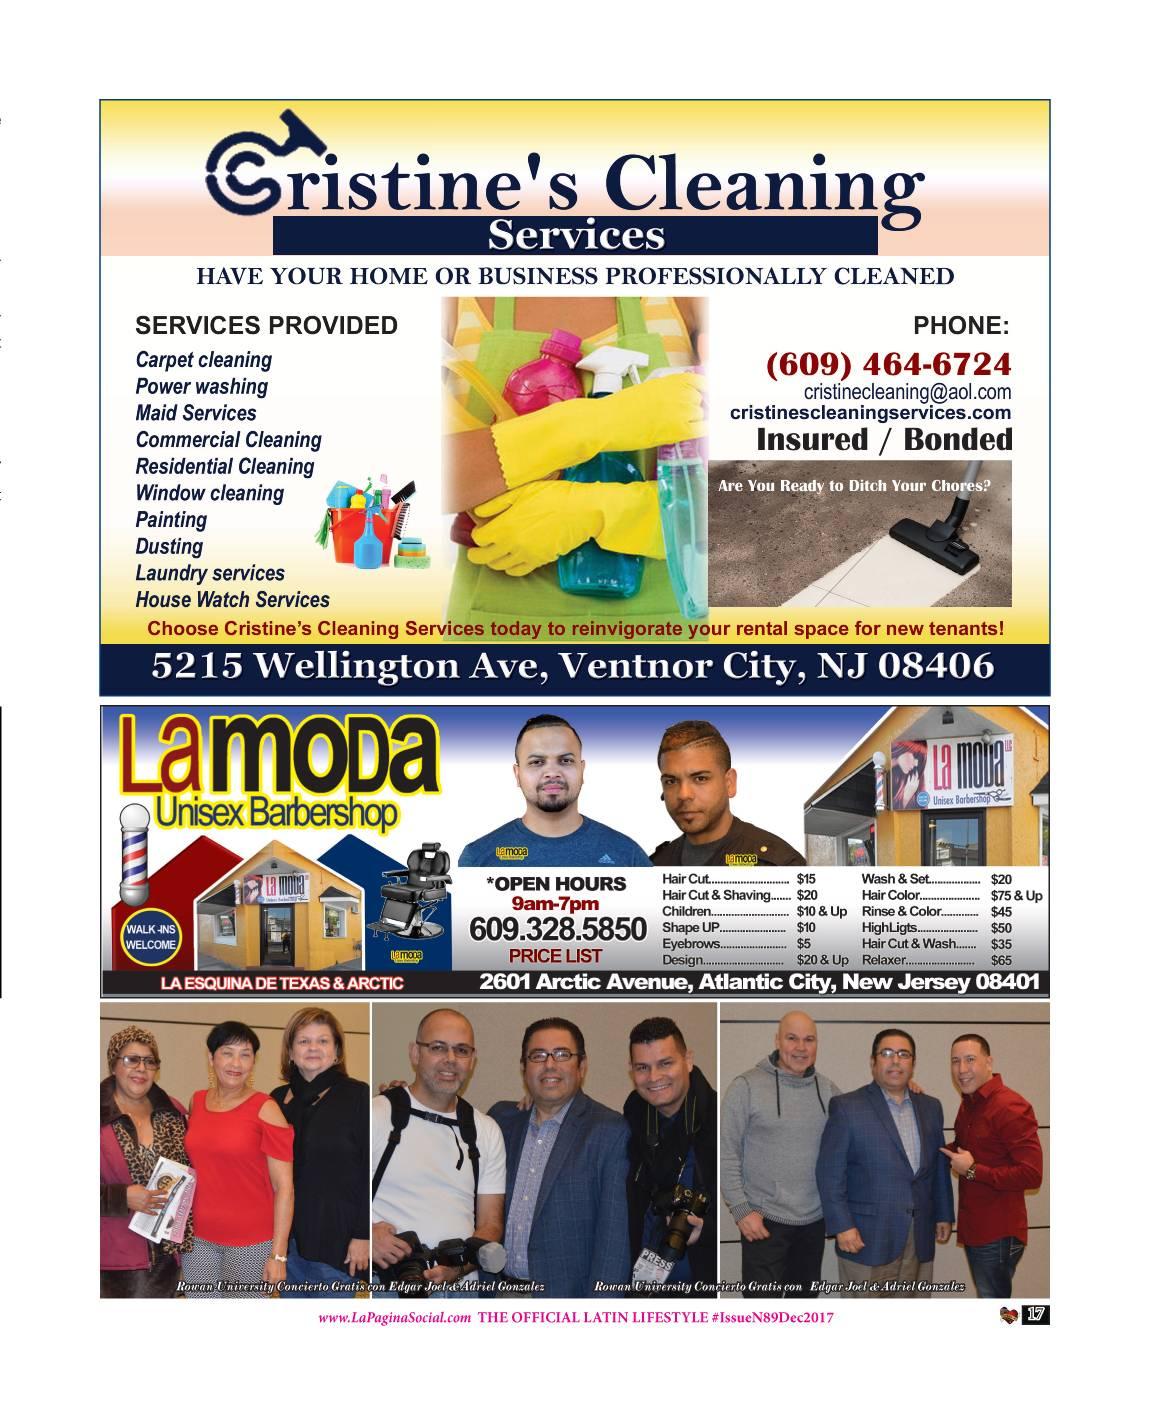 CHRISTINE'S CLEANING / LA MODA